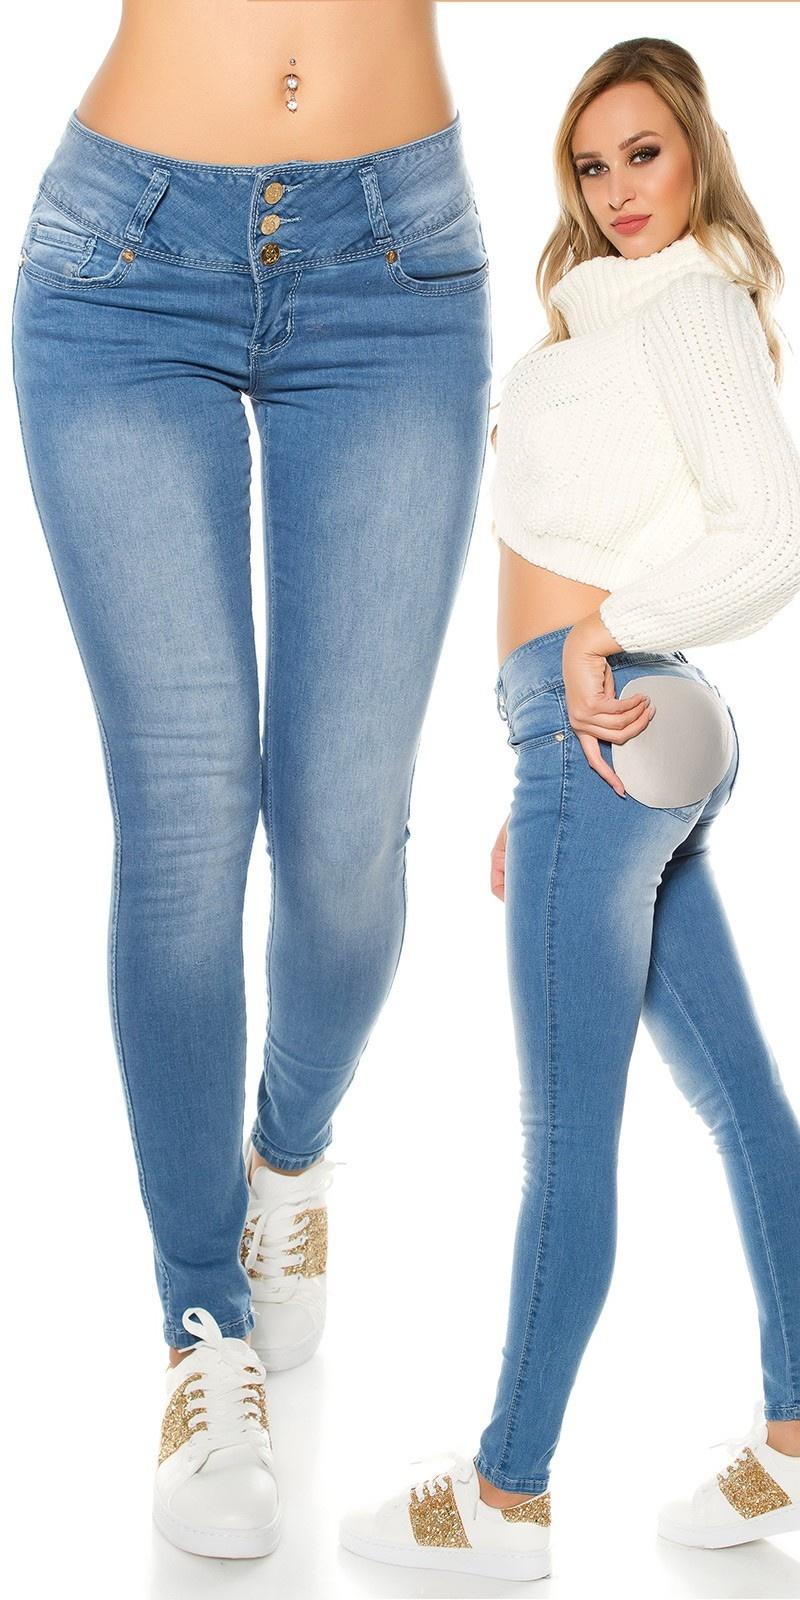 Sexy Koucla MAGIC BOOTY Push Up skinnyJeans Jeansblue